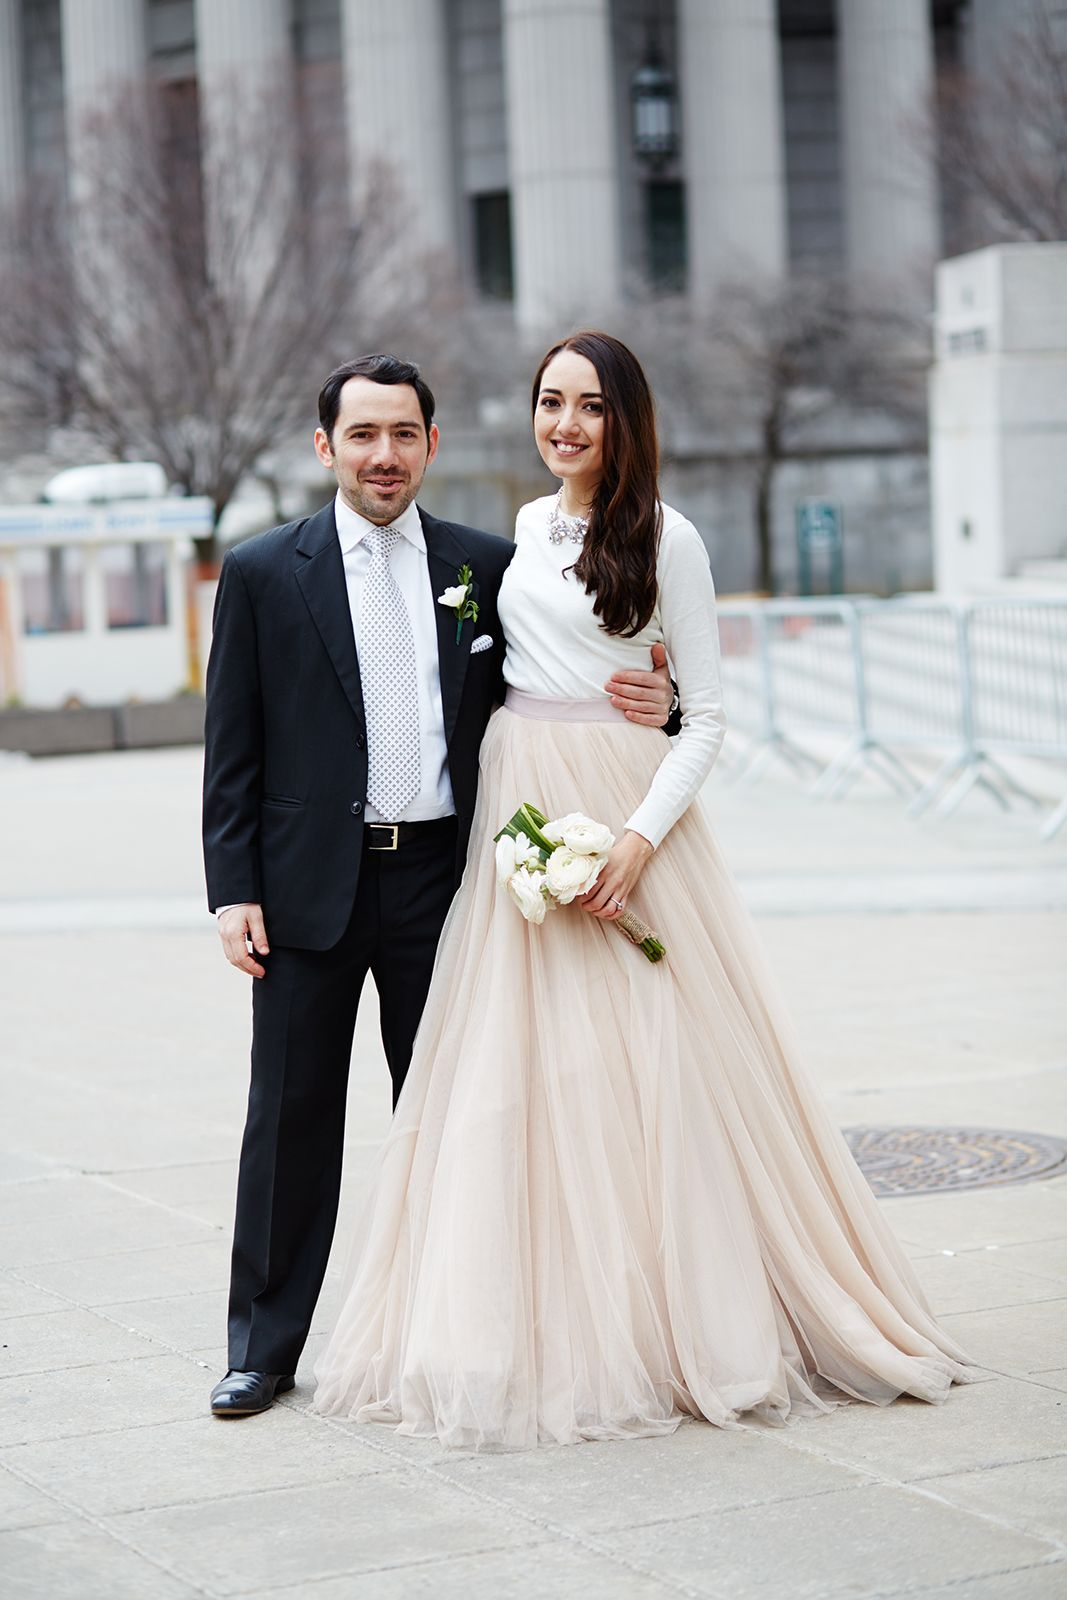 Civil Wedding Tutu Dresses Fashion Dresses,Evening Dresses For Wedding Guests